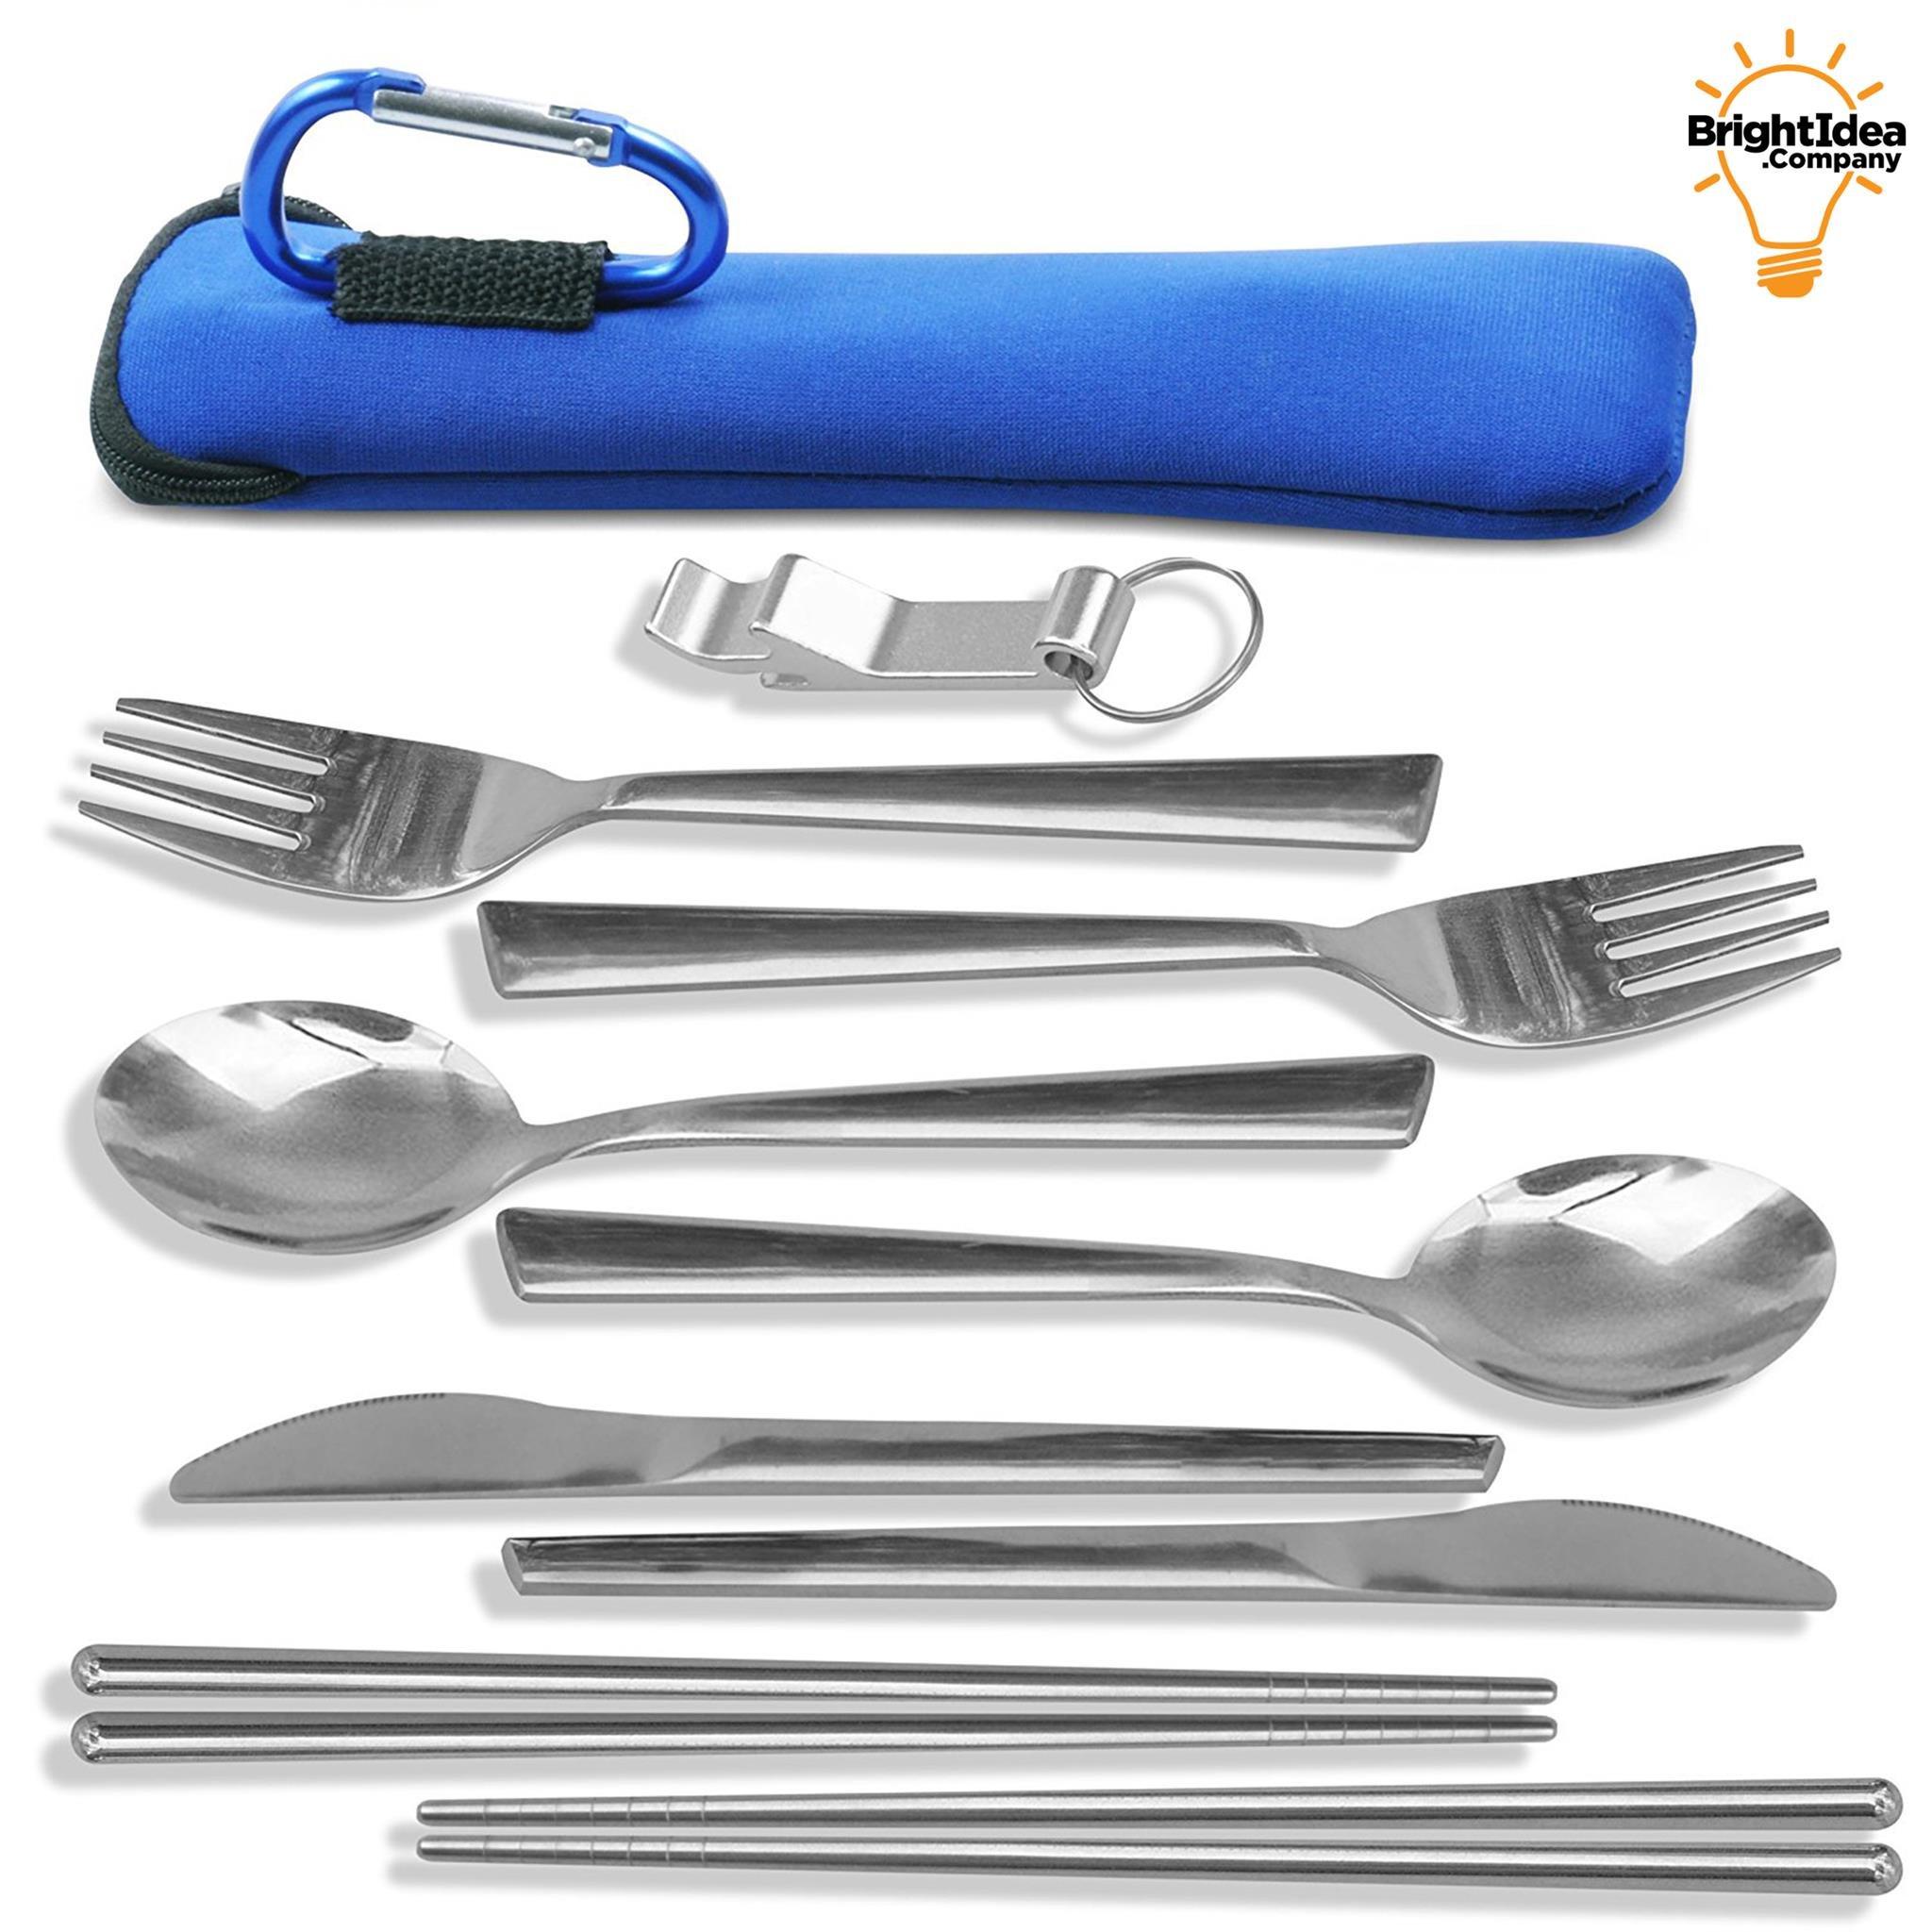 TravelSource Unbreakable Camping Eating Utensils Kit - 2-Person Stainless Steel Utensils Set - Portable Mess Kit with Neoprene Case, Backpack Hanging Carabiner, Chopsticks & Bottle Opener